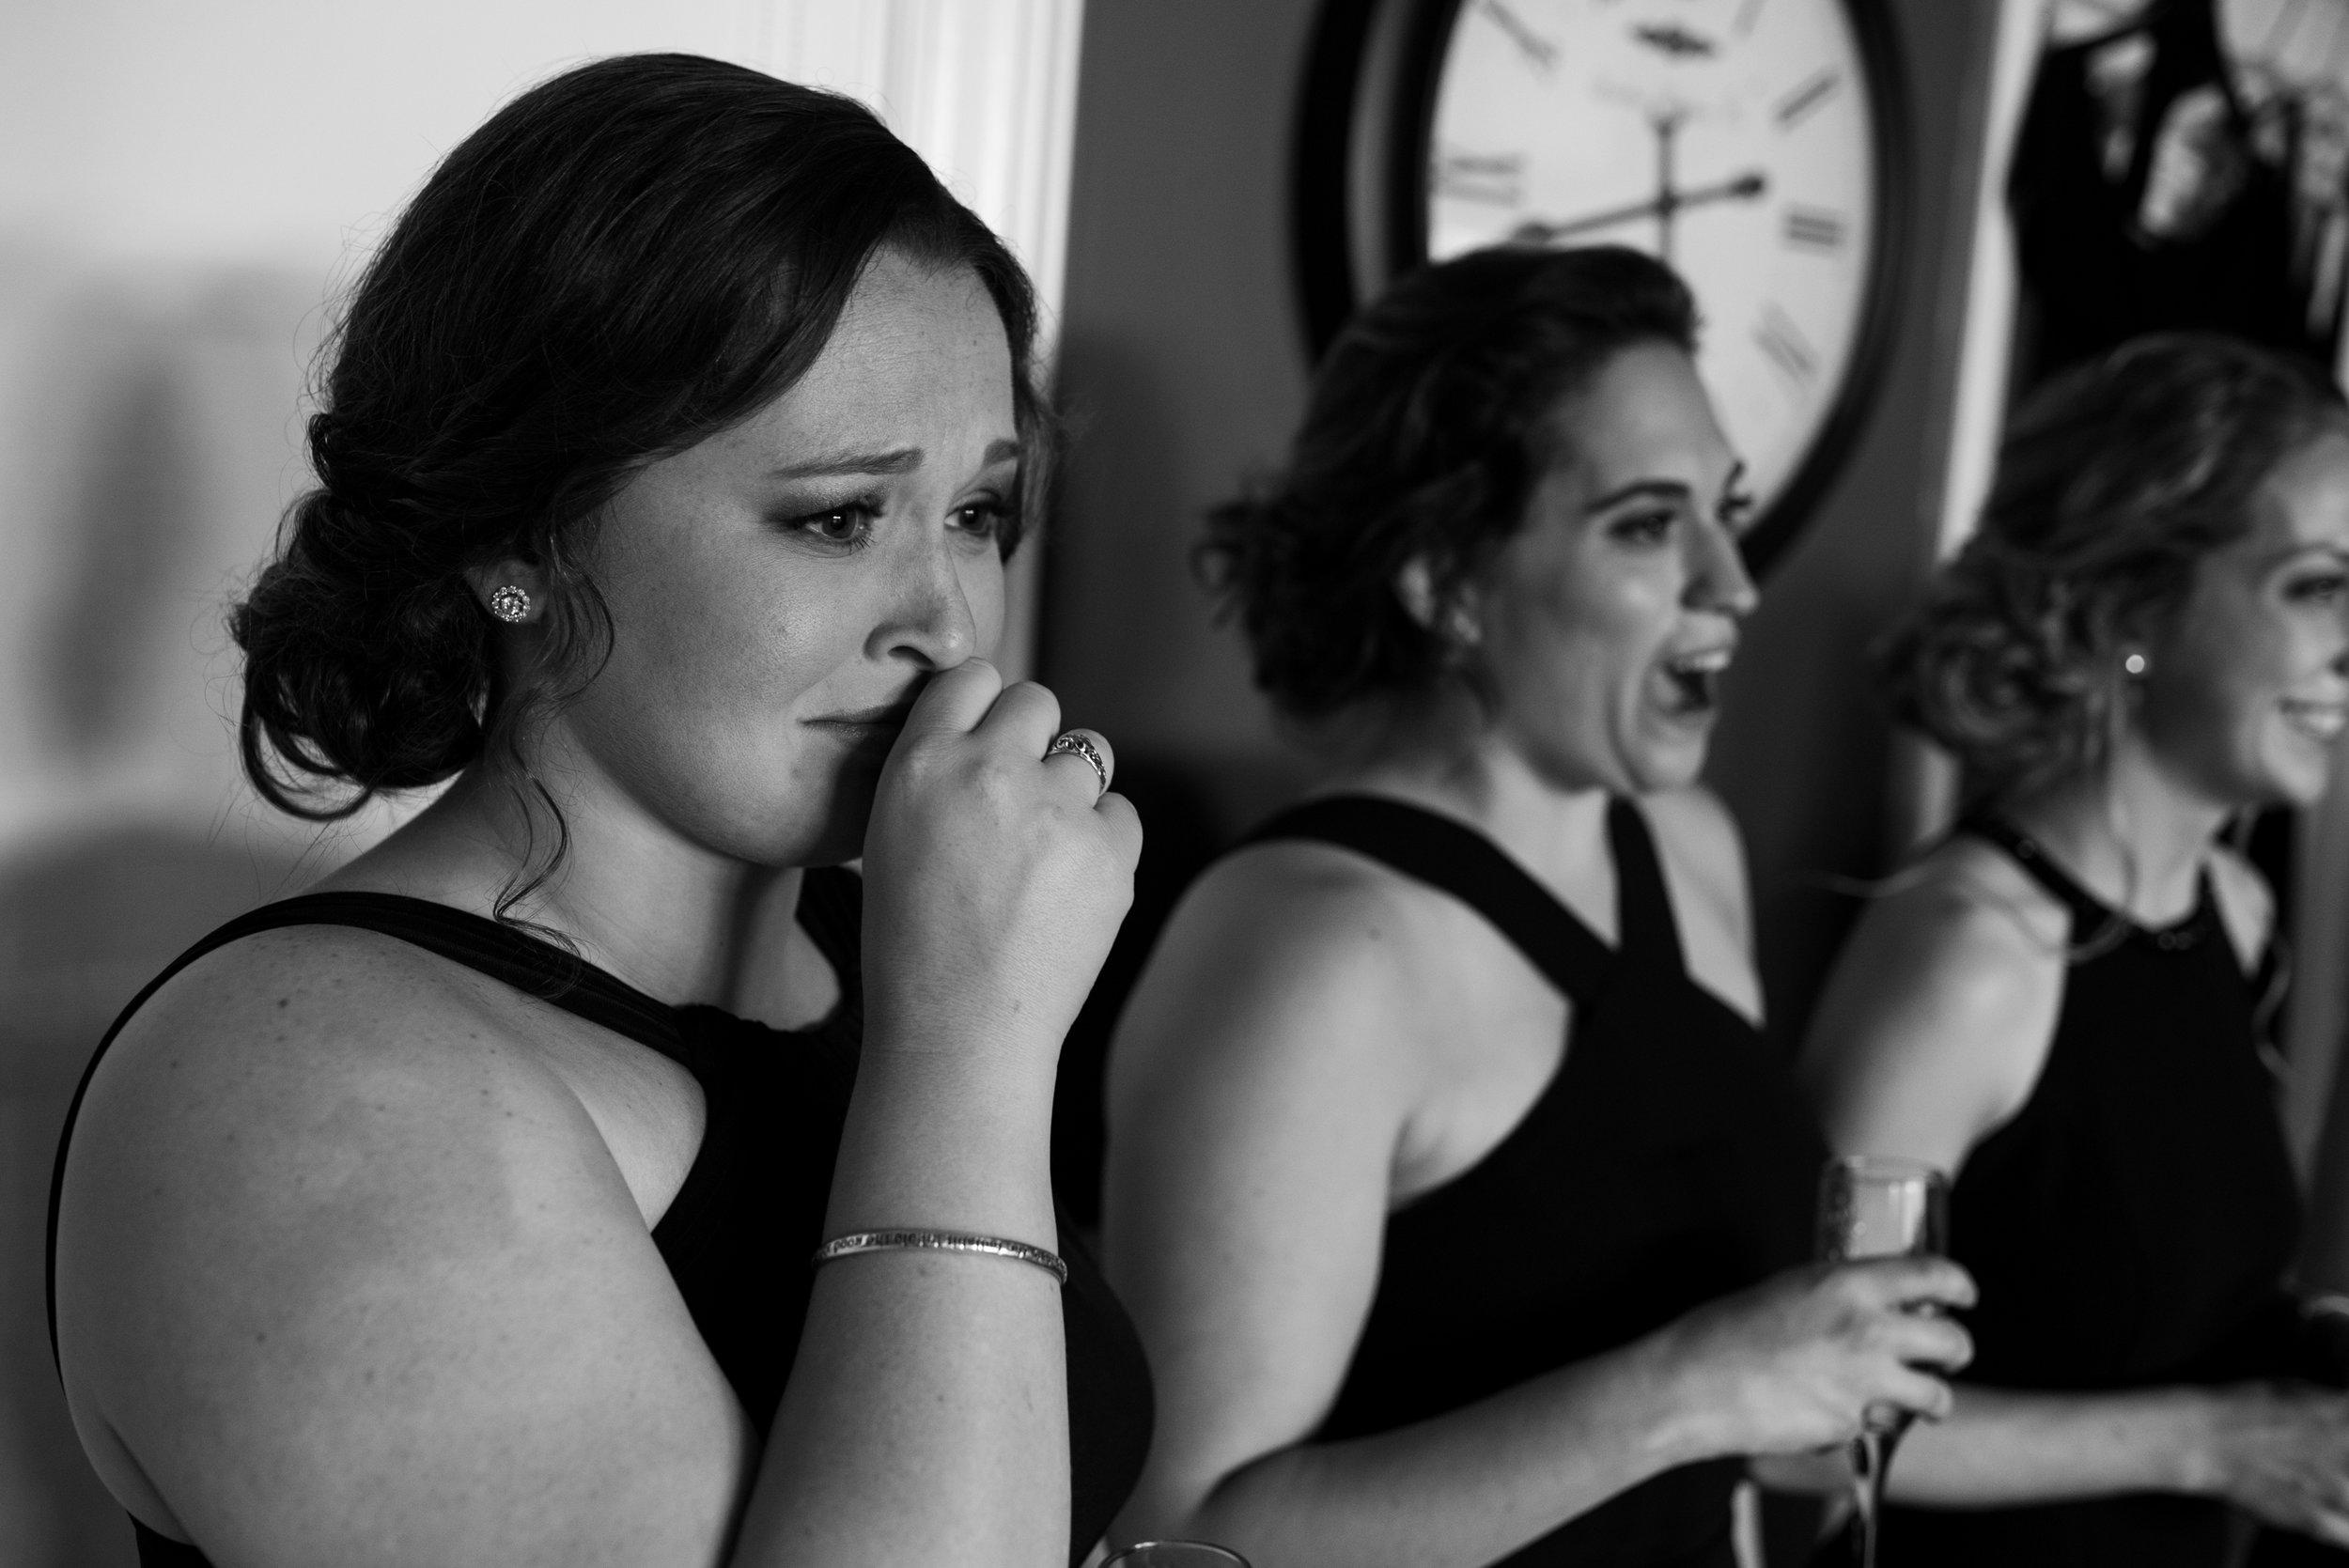 st-augustine-photographer-st-augustine-gay-wedding-sam-sex-wedding-photographer-sarah-annay-photography-white-room-weddings-18.jpg